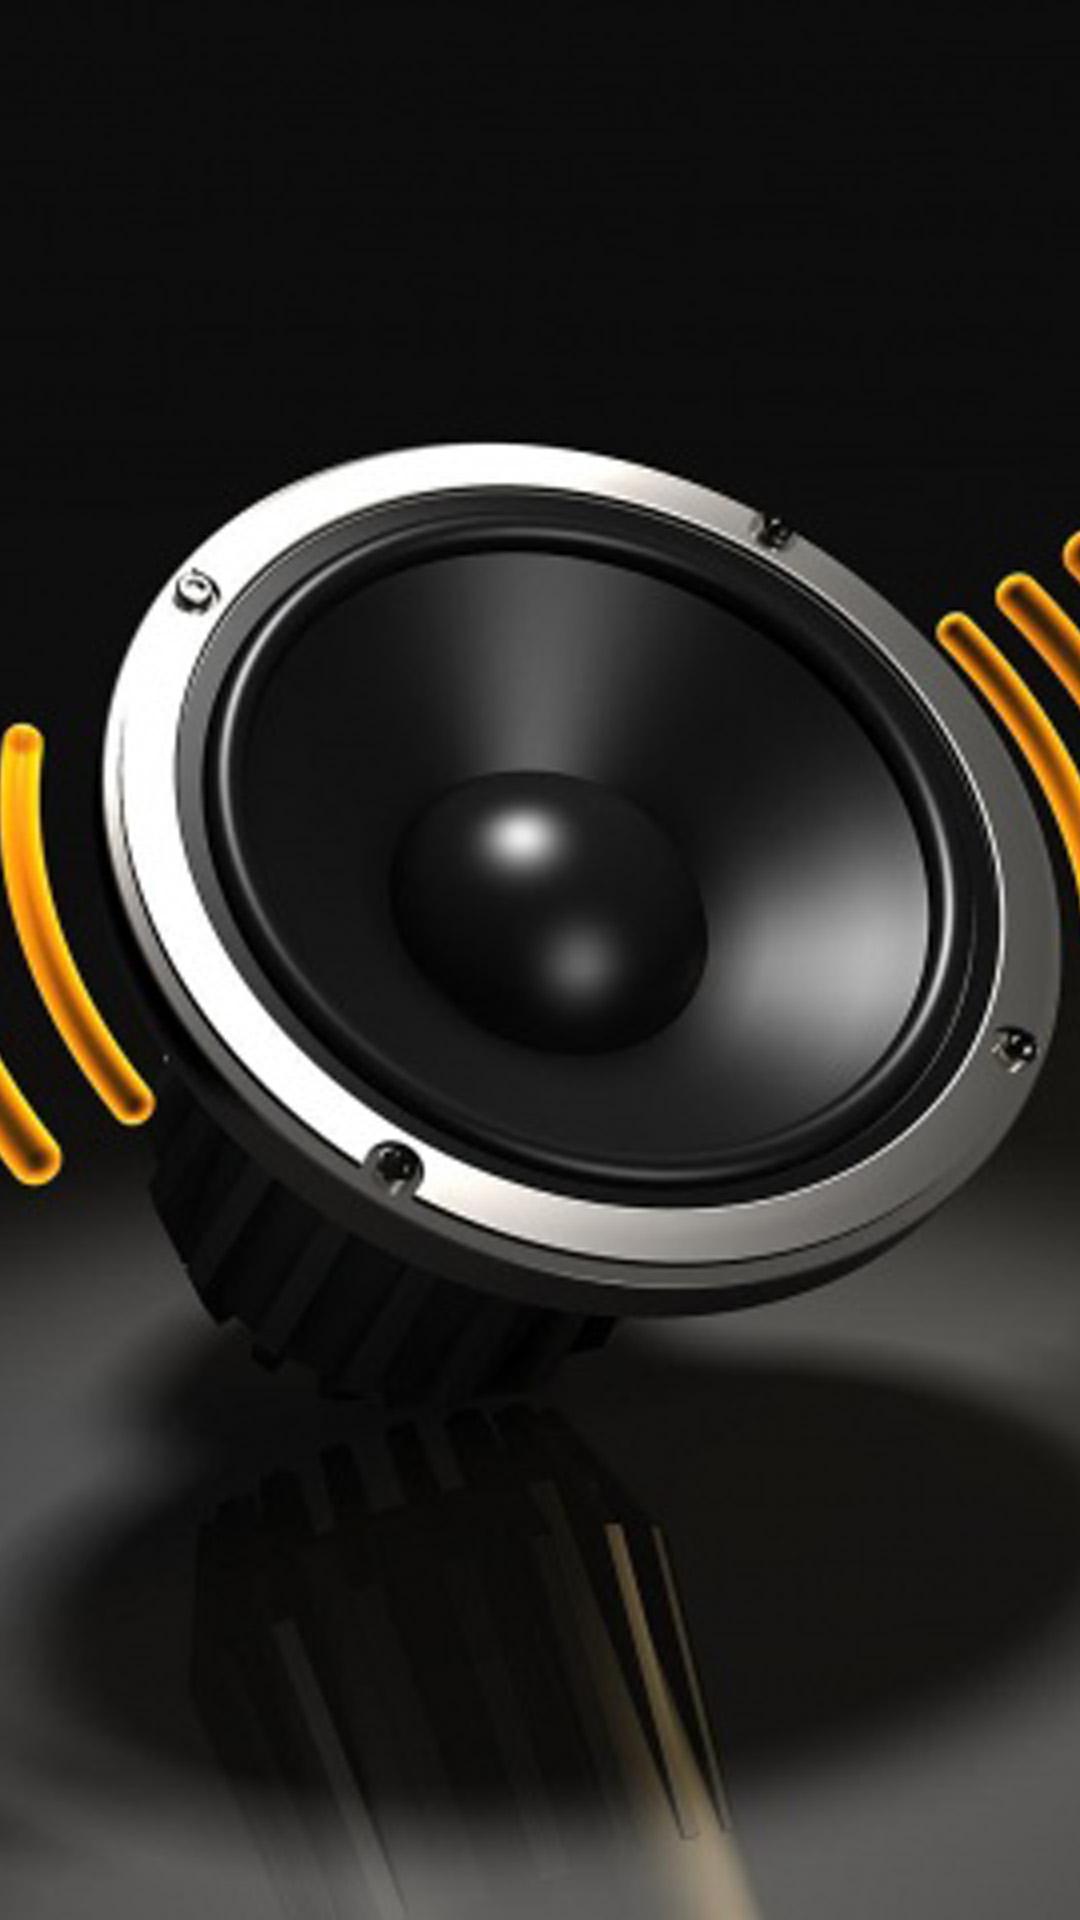 Black Speaker Lockscreen Android Wallpaper Example Picture